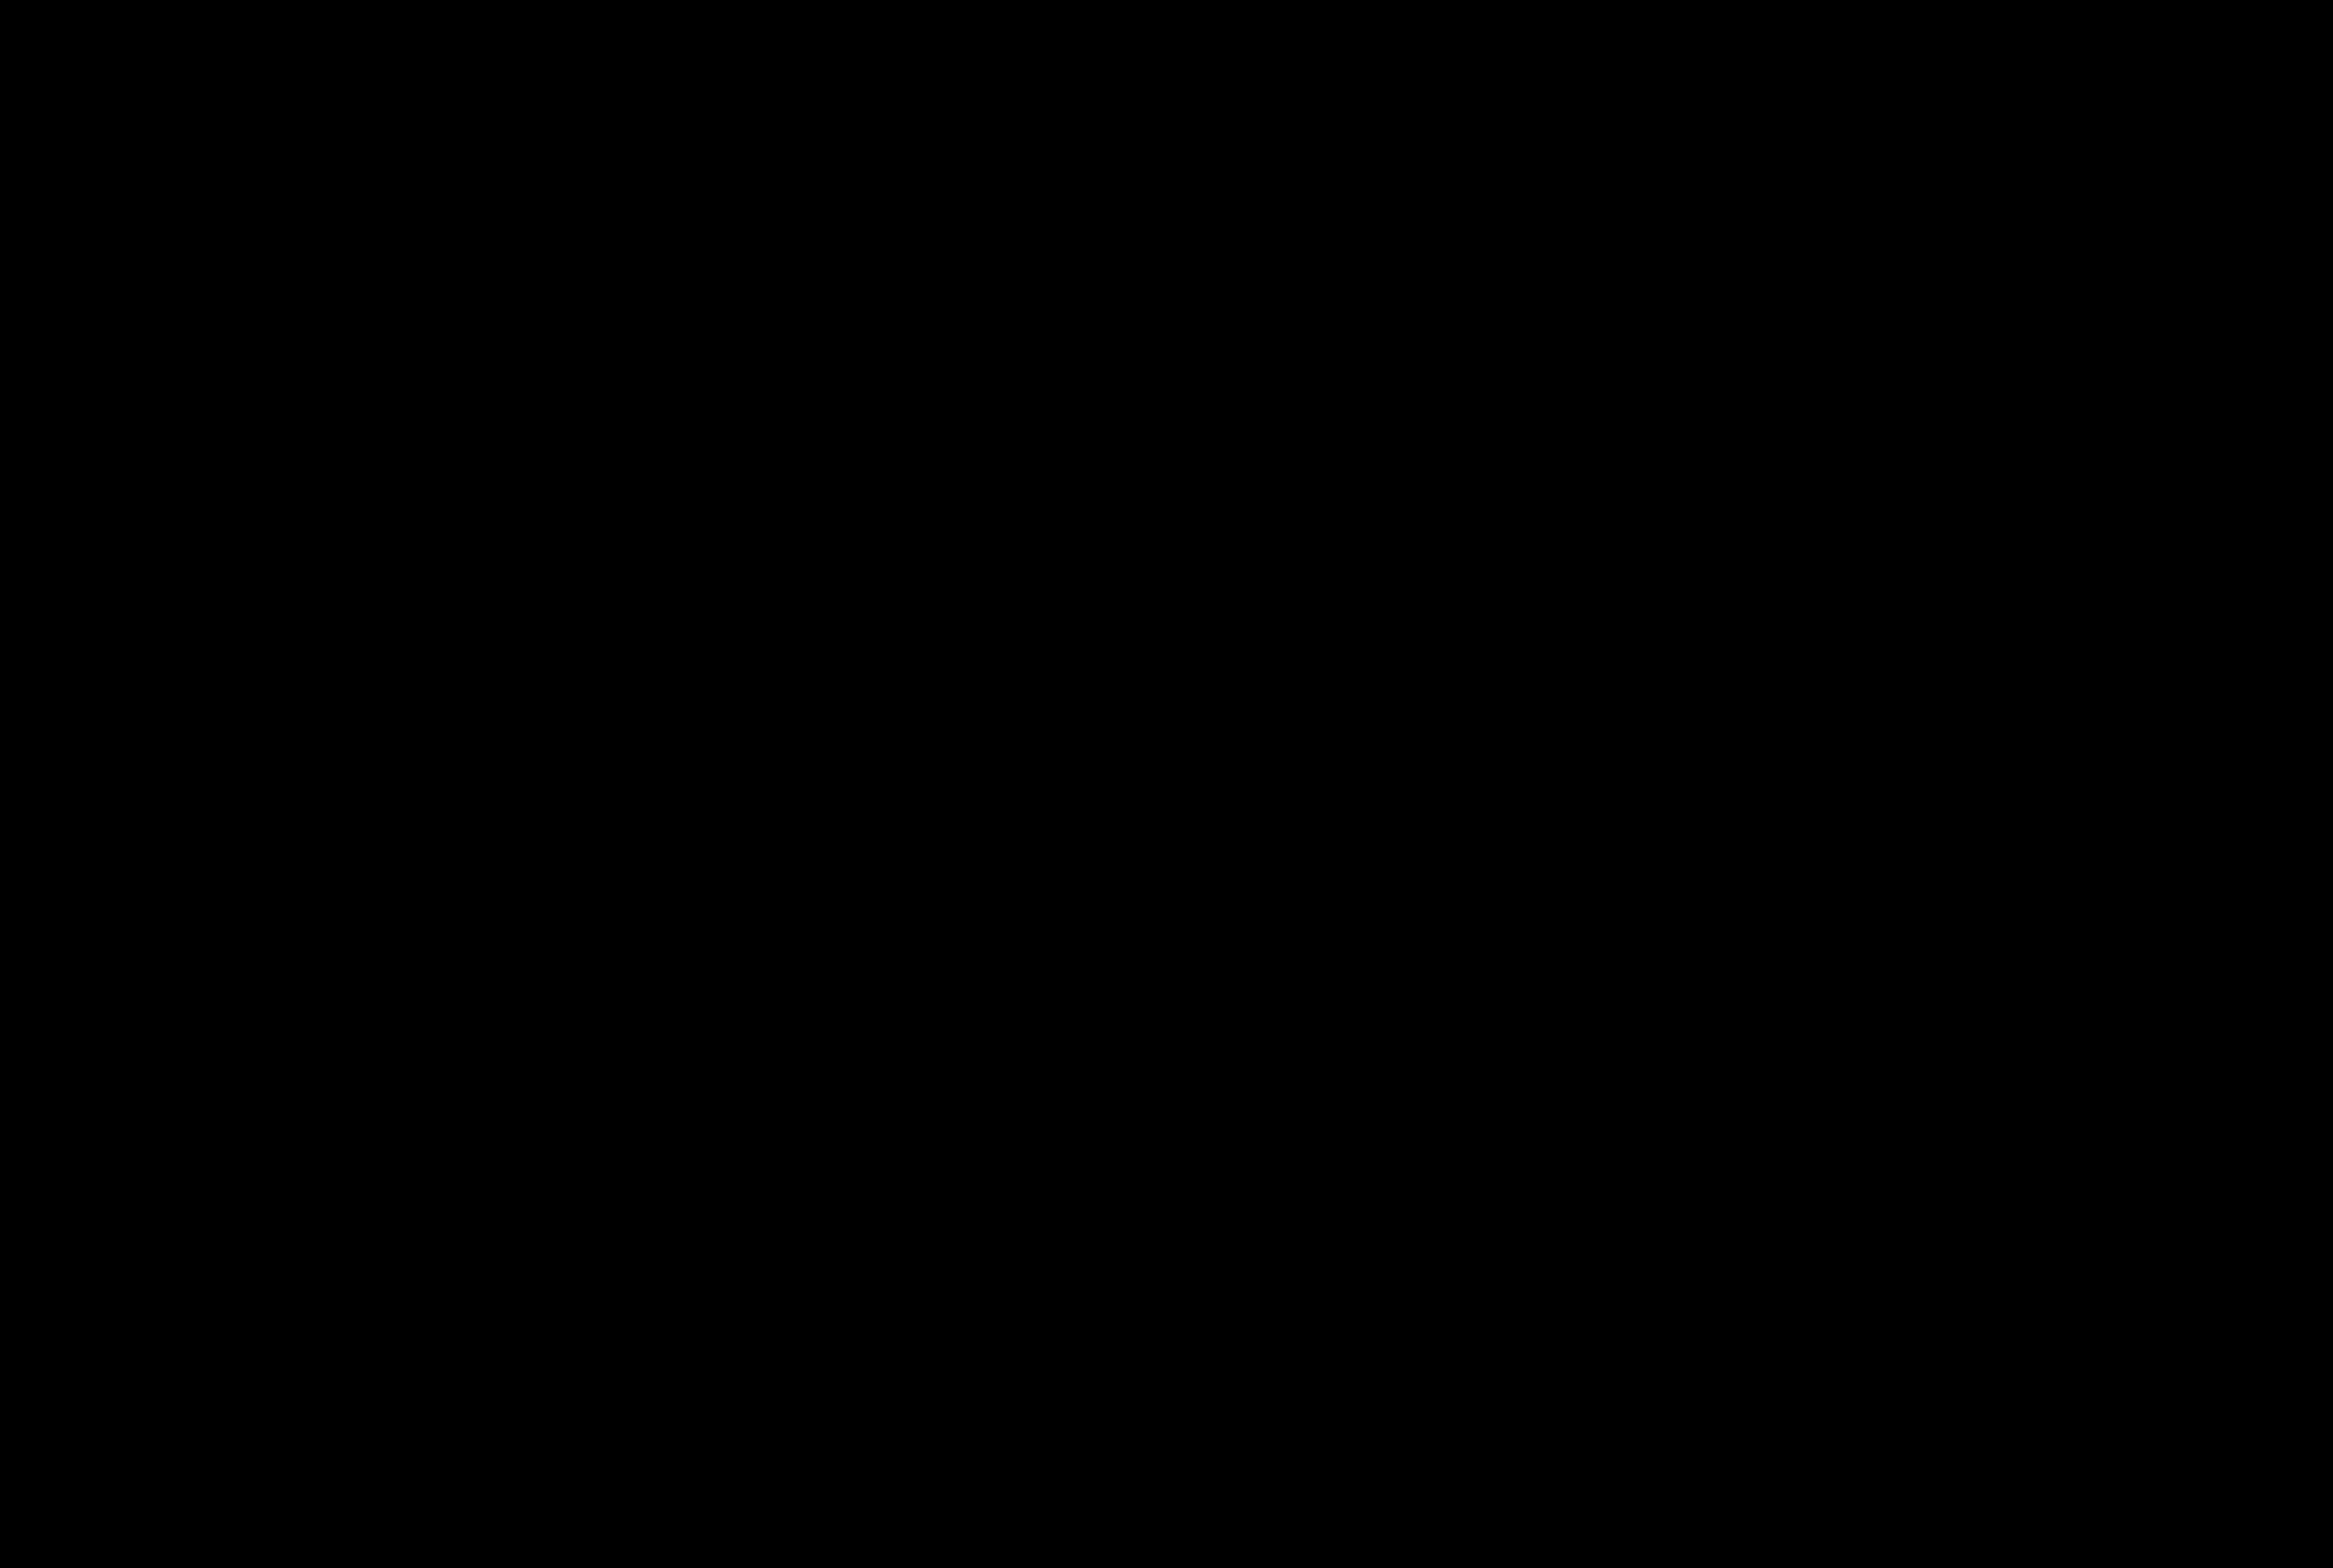 Five Ancient Pagan Symbols Misused & Misinterpreted in